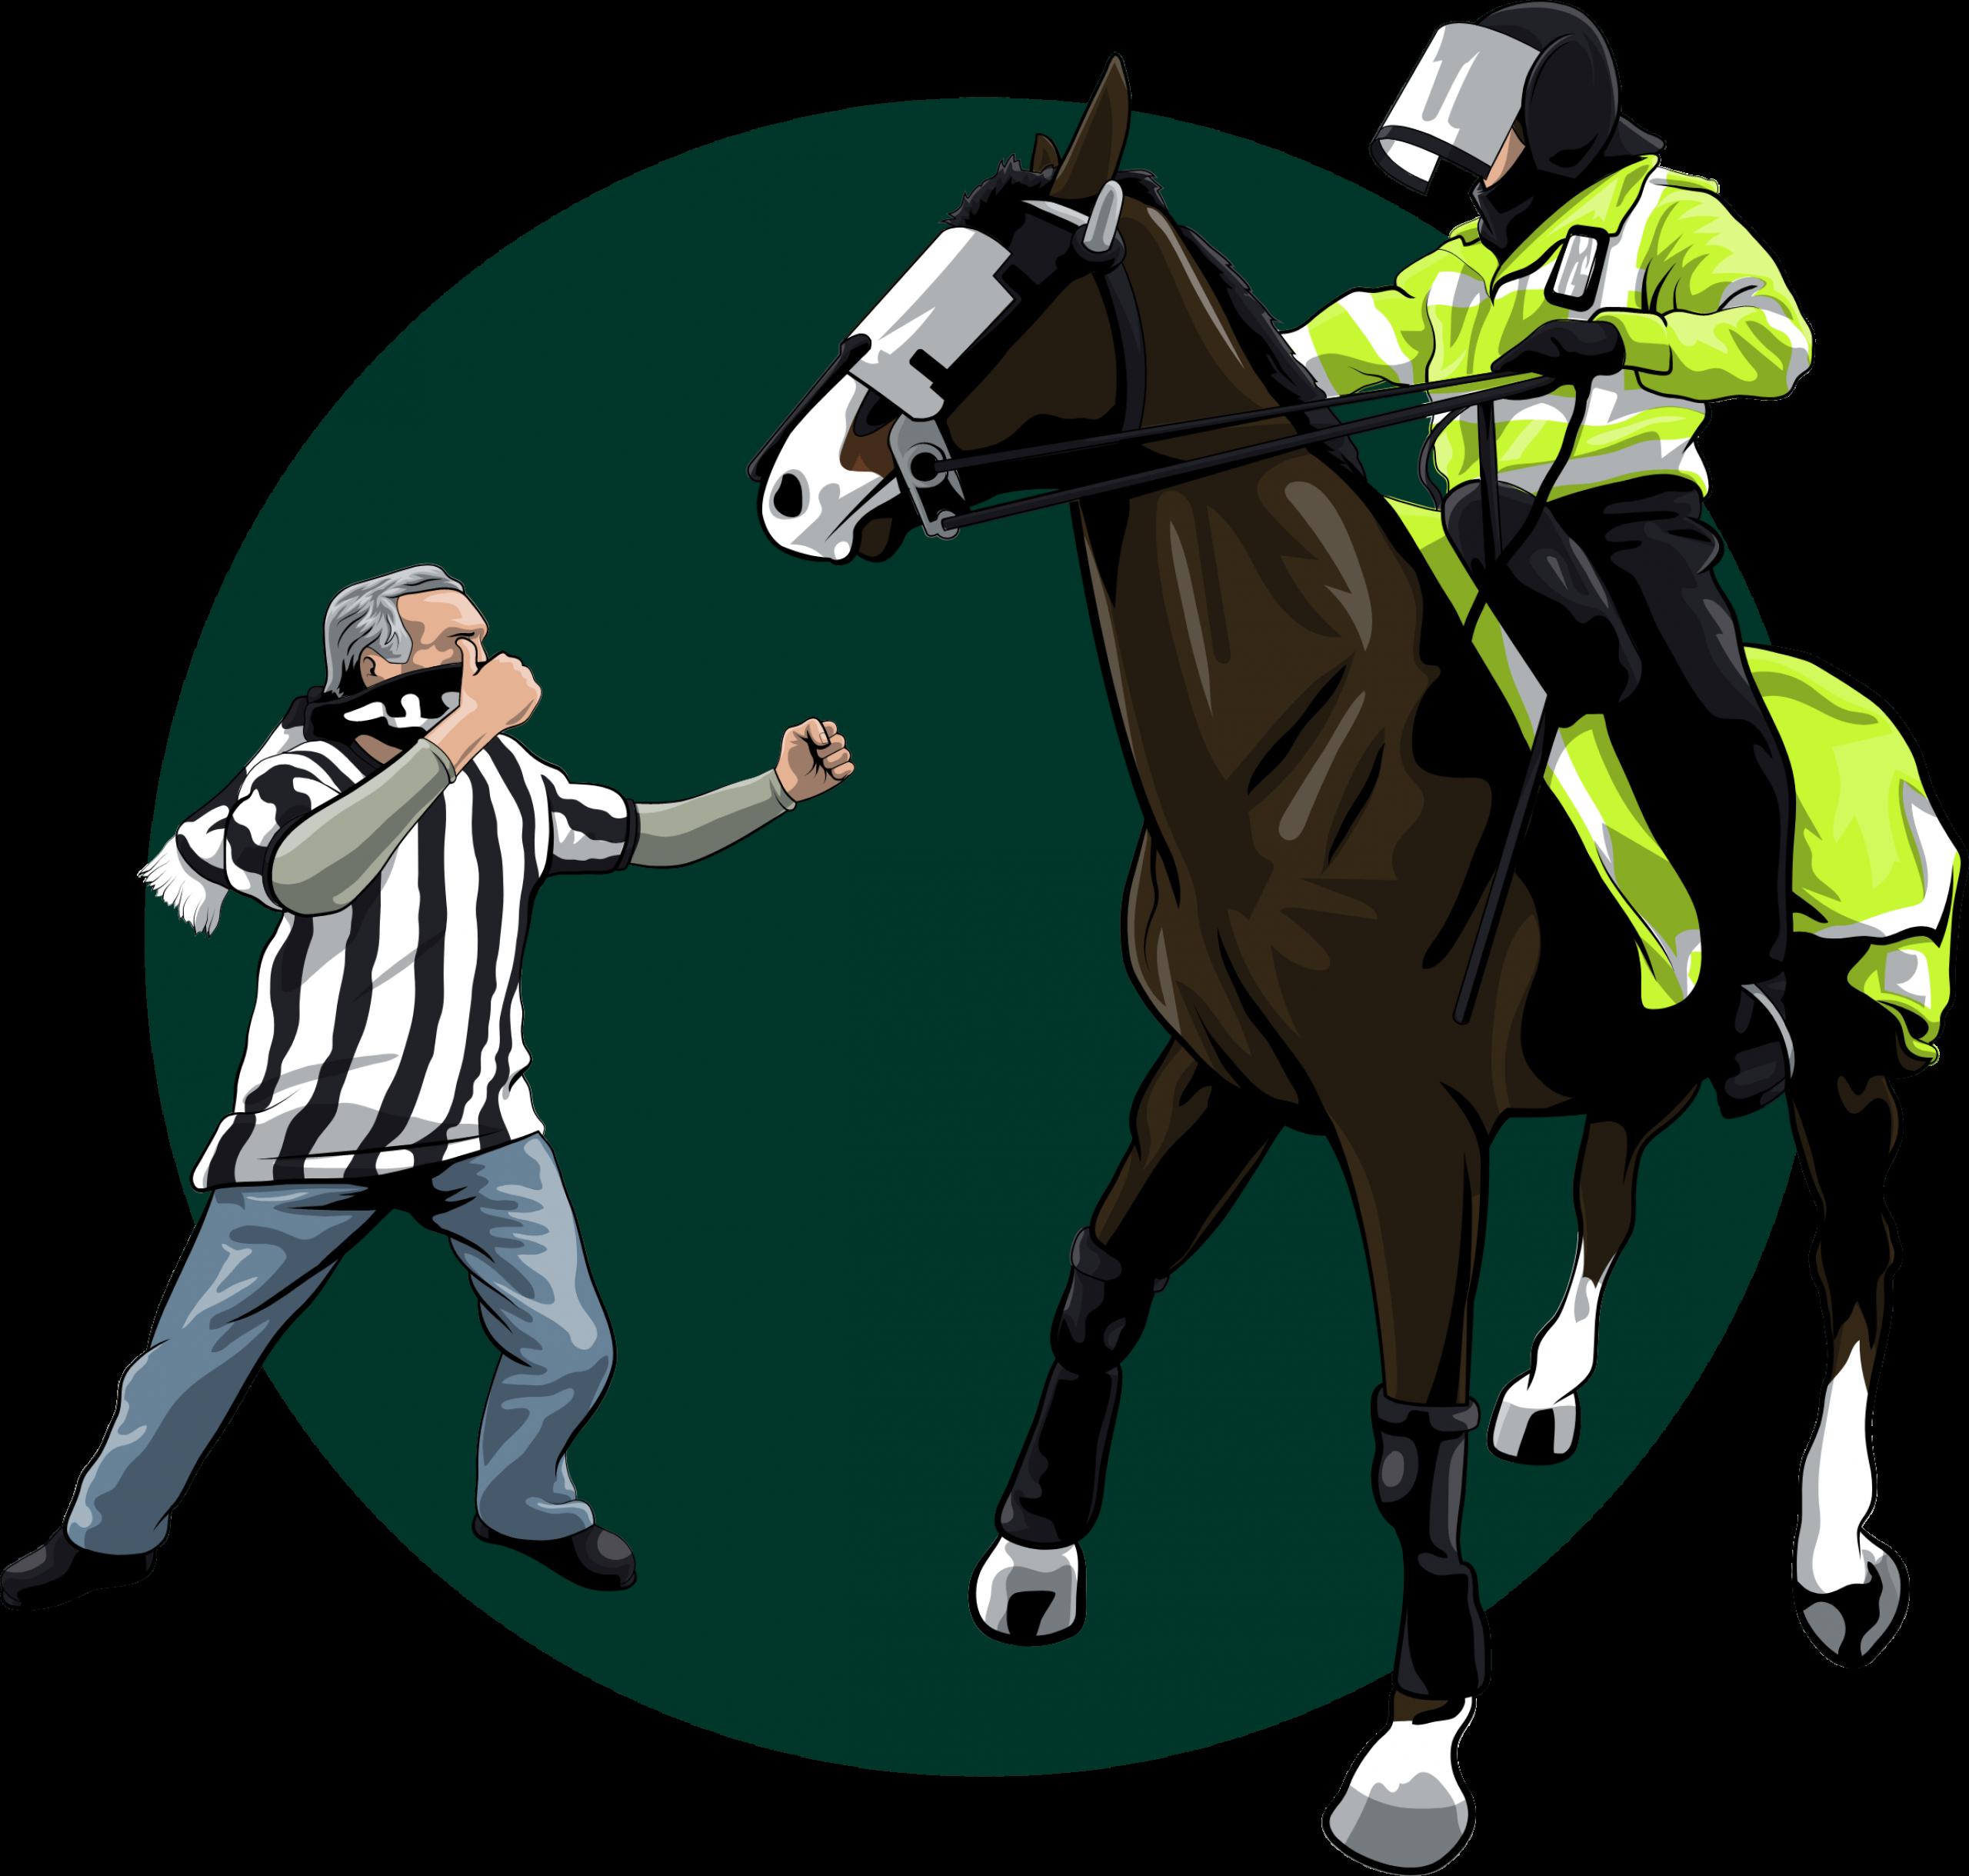 Newcastle fan punching a horse illustration